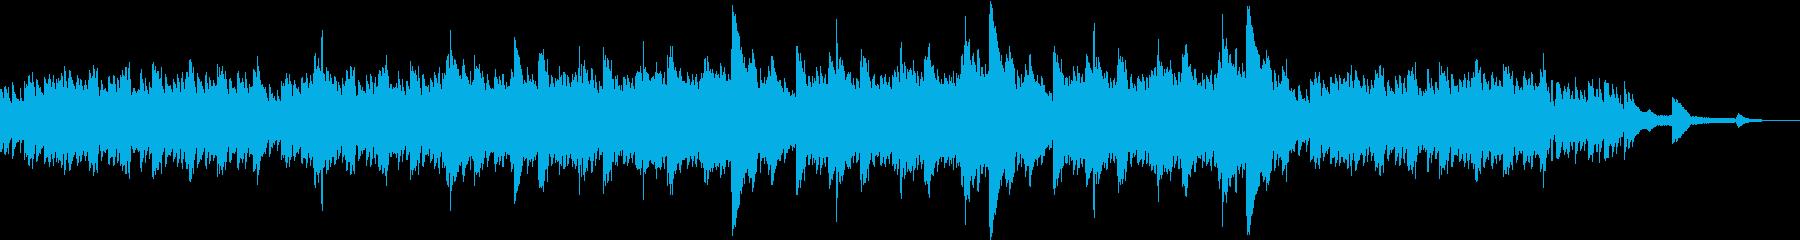 Piano Calmingの再生済みの波形